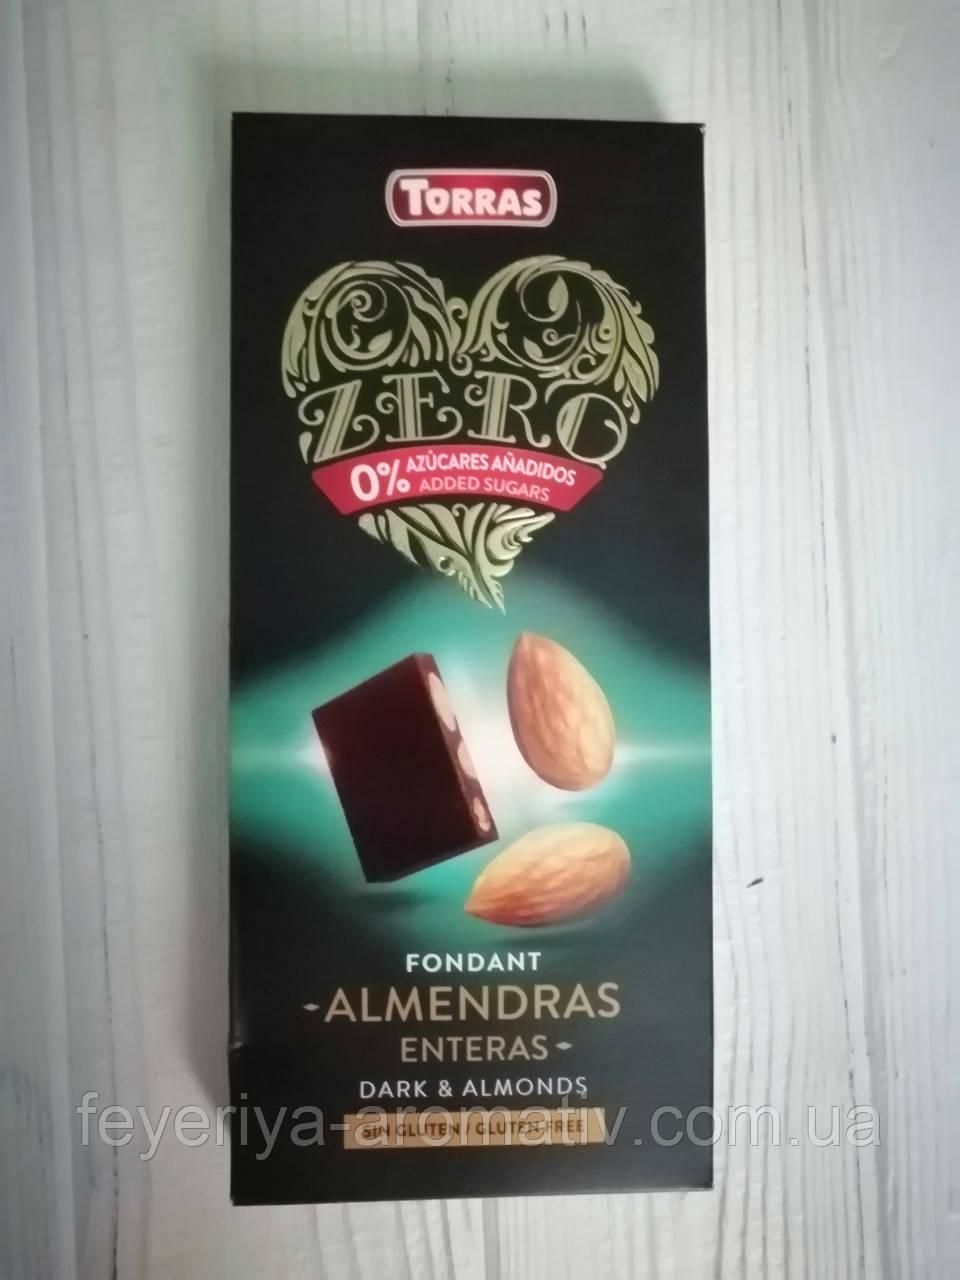 Шоколад без сахара и глютена Torras Dark & Almonds 150гр (Испания)